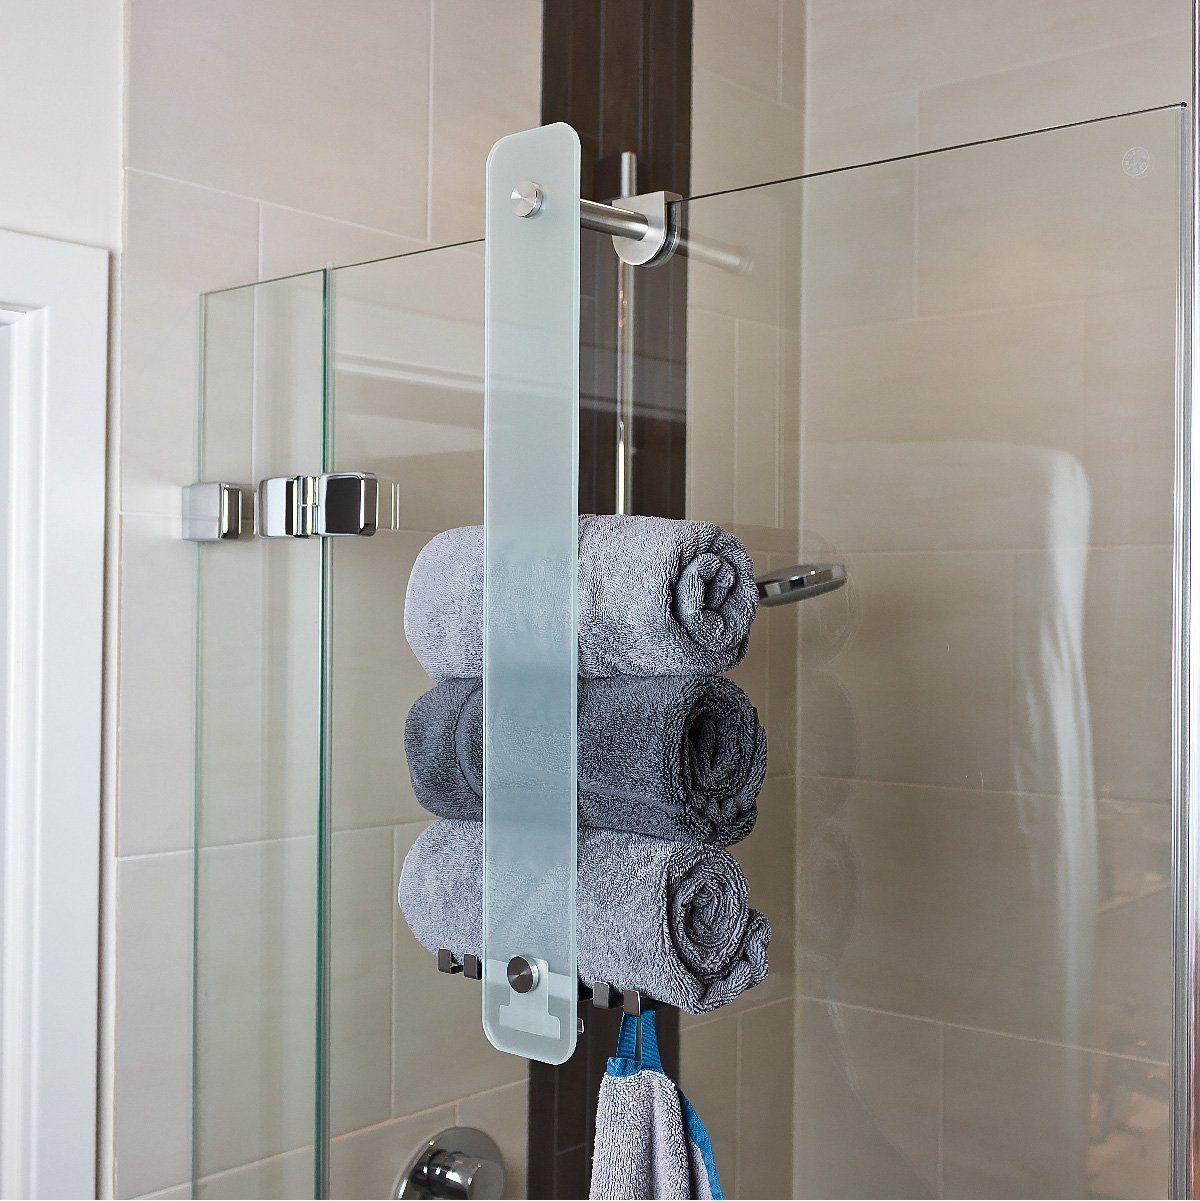 Bremermann Badserie Piazza Edelstahl Glashandtuchhalter Regale Furs Badezimmer Badezimmer Dekor Badezimmer